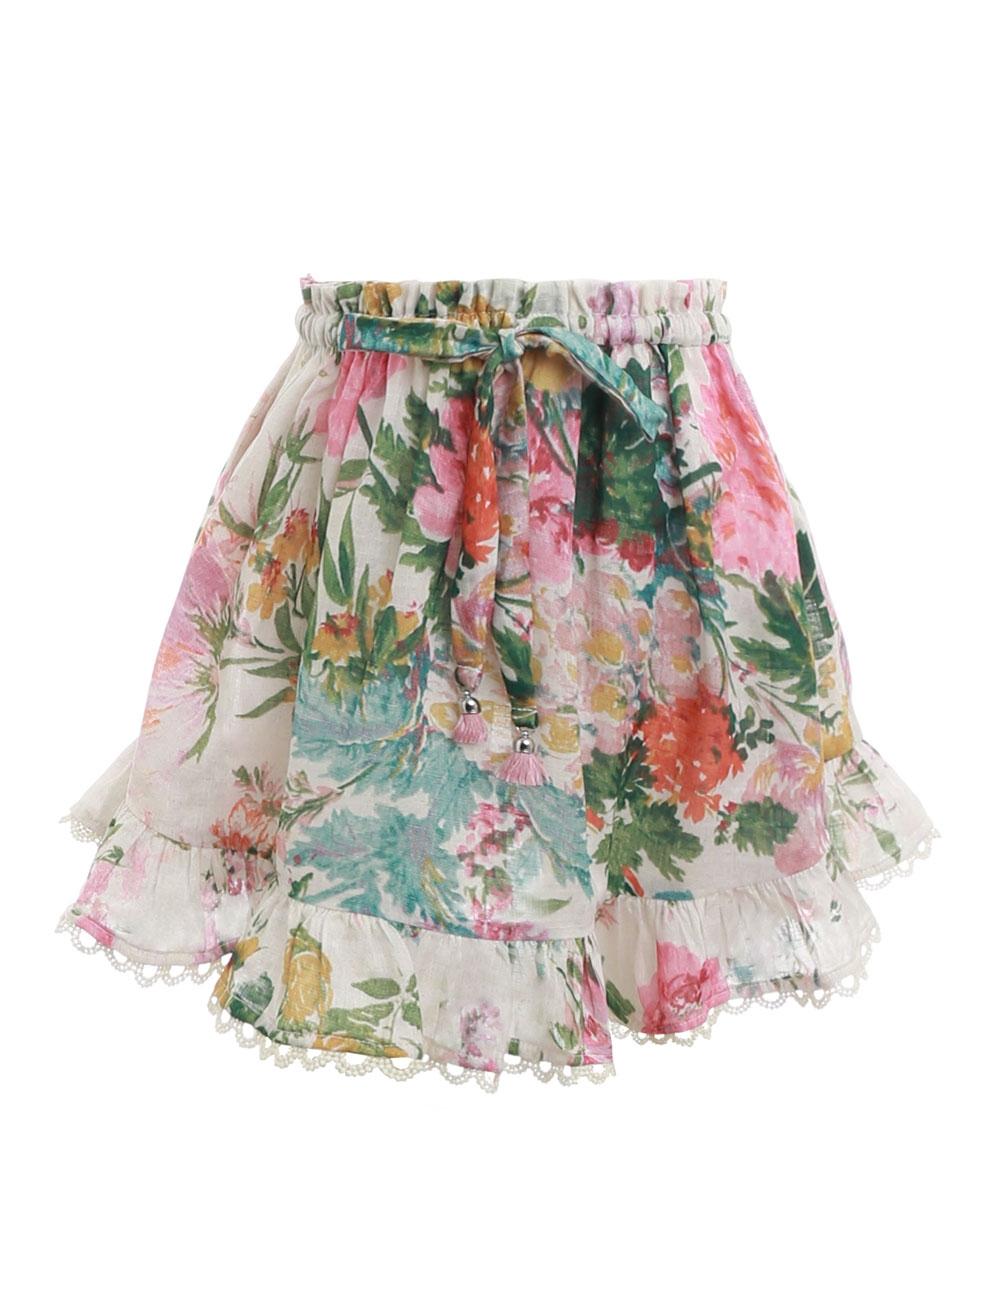 Heathers Flounce Skirt